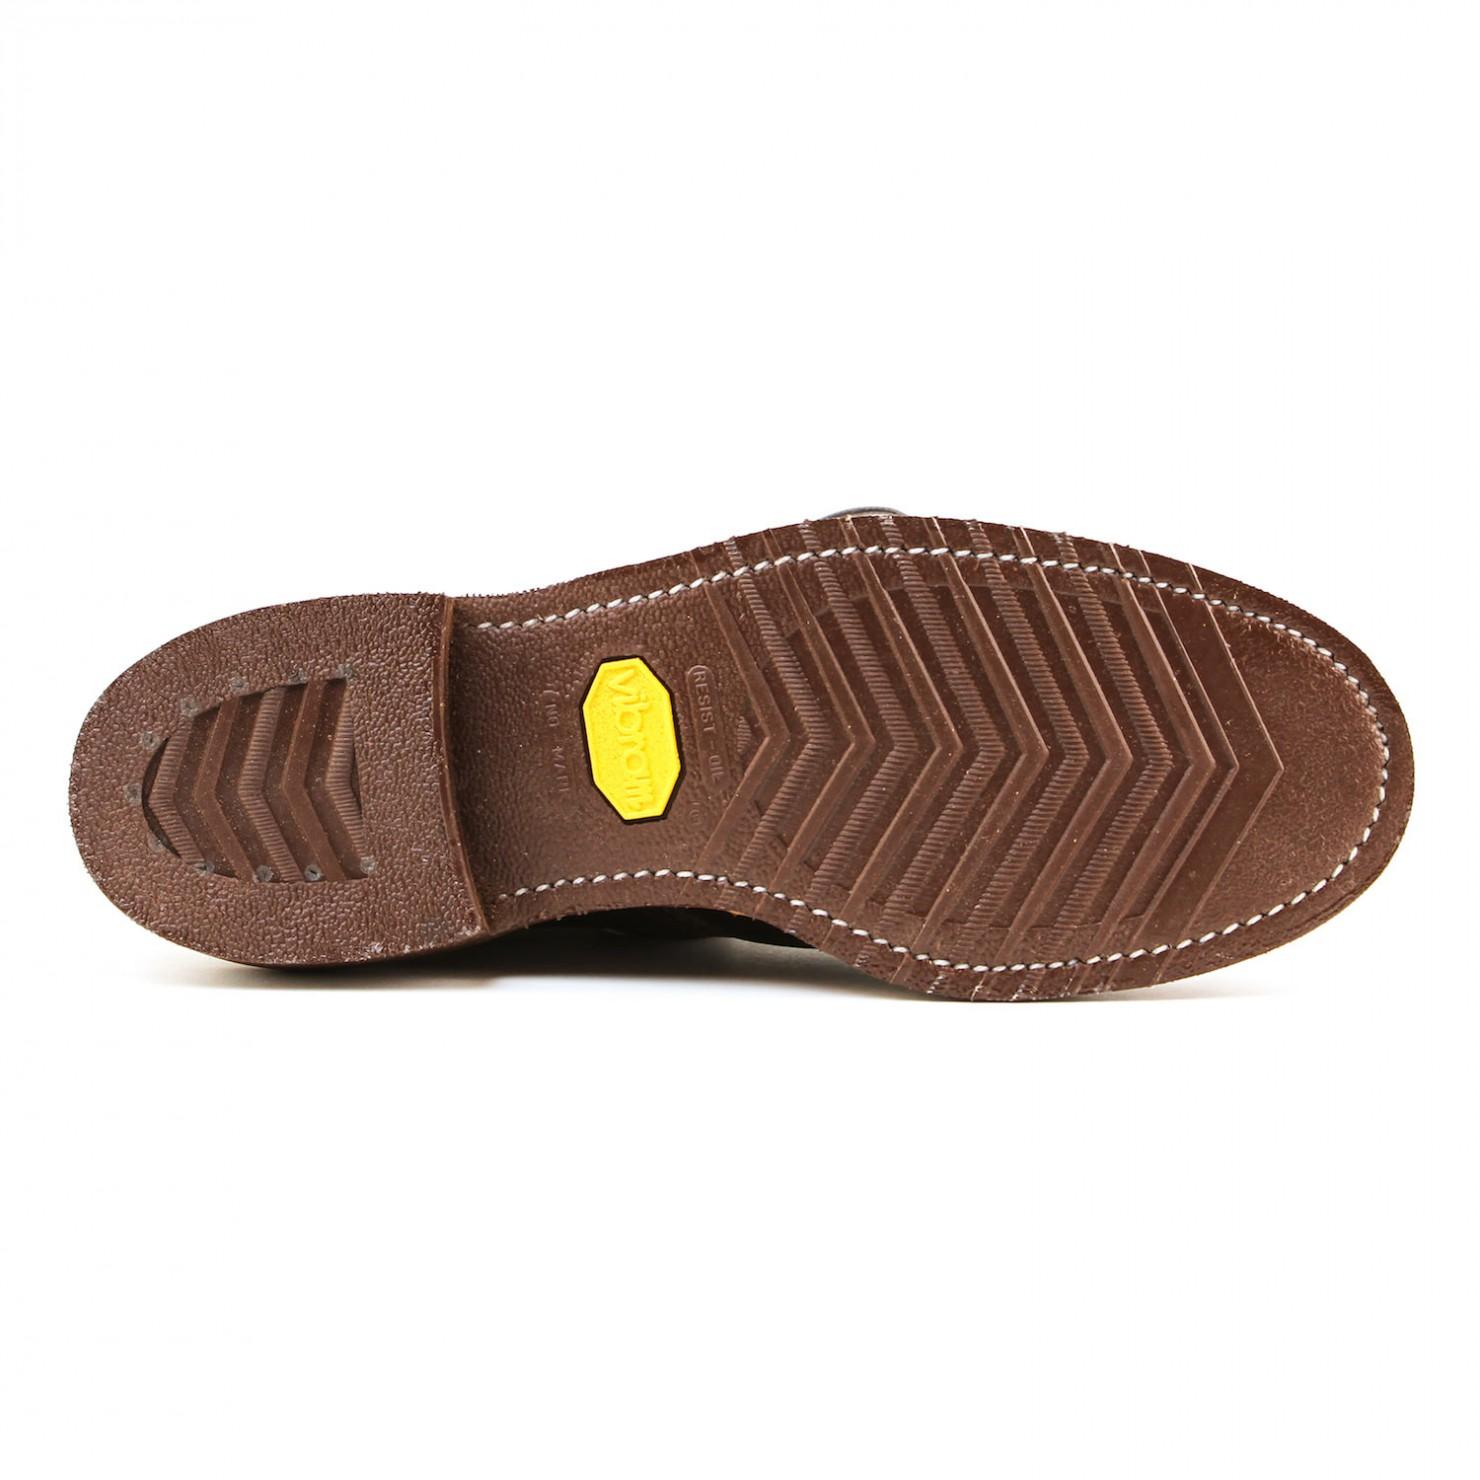 Chippewa 6 Inch Service Boot 2